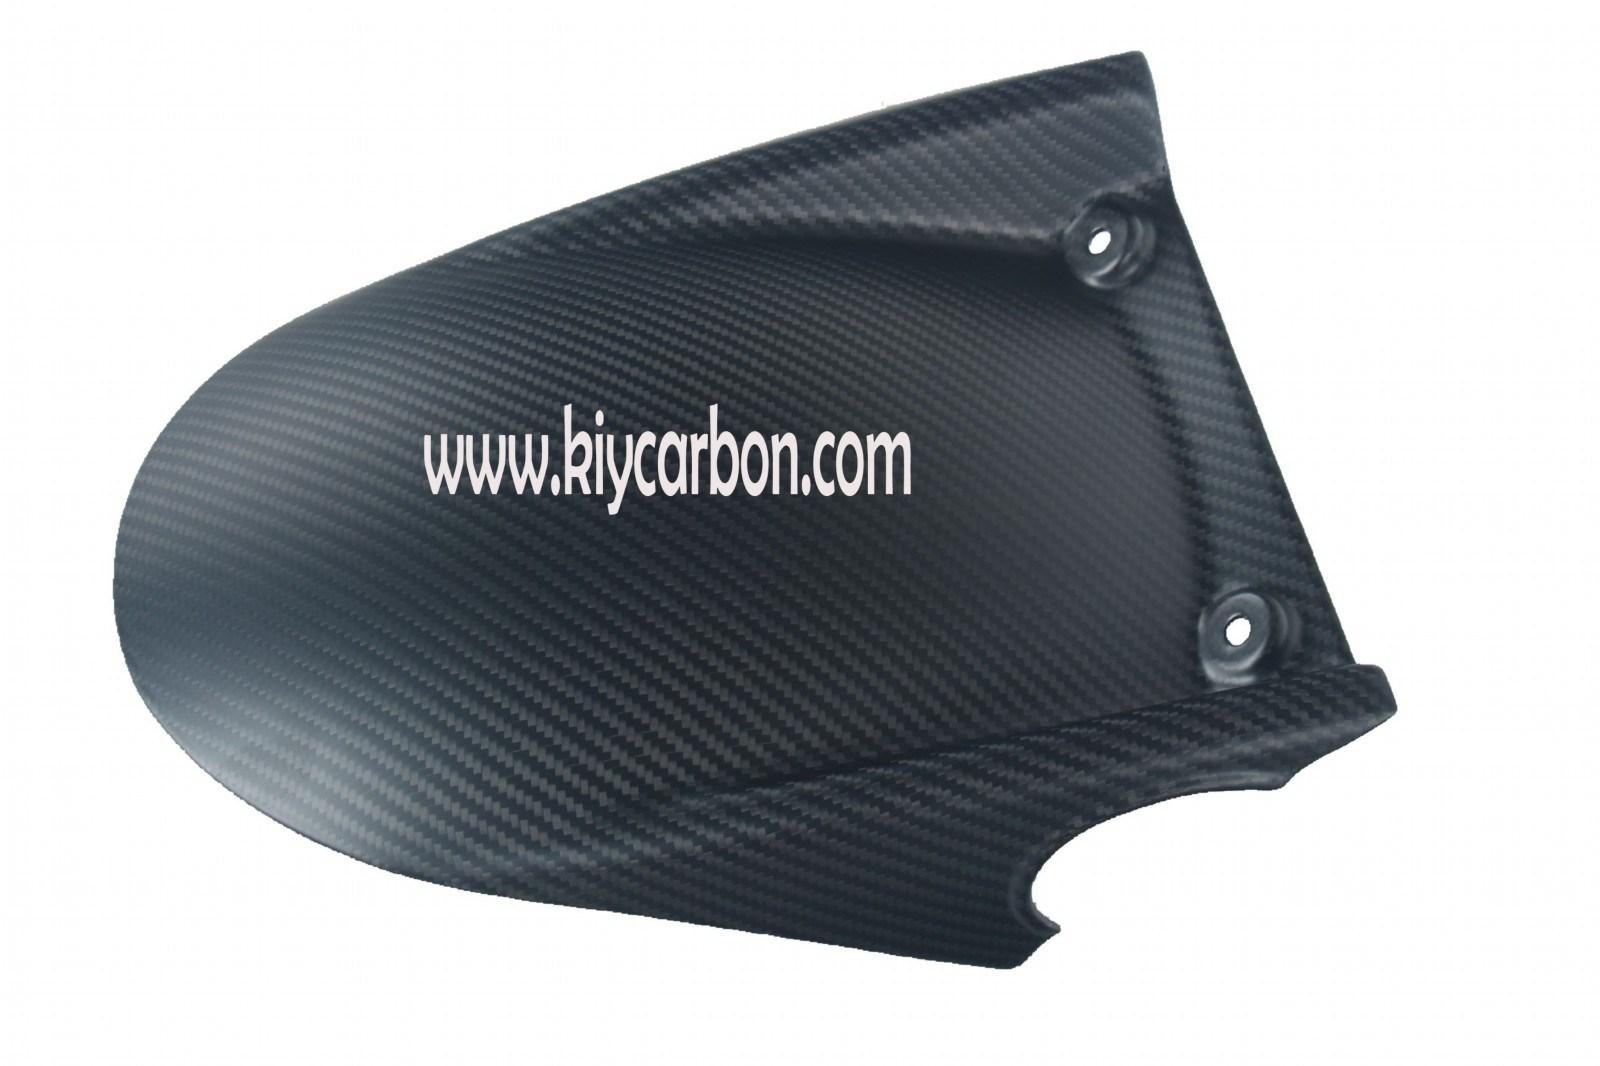 Carbon Motorcycle Rear Hugger for Aprilia Rsv4